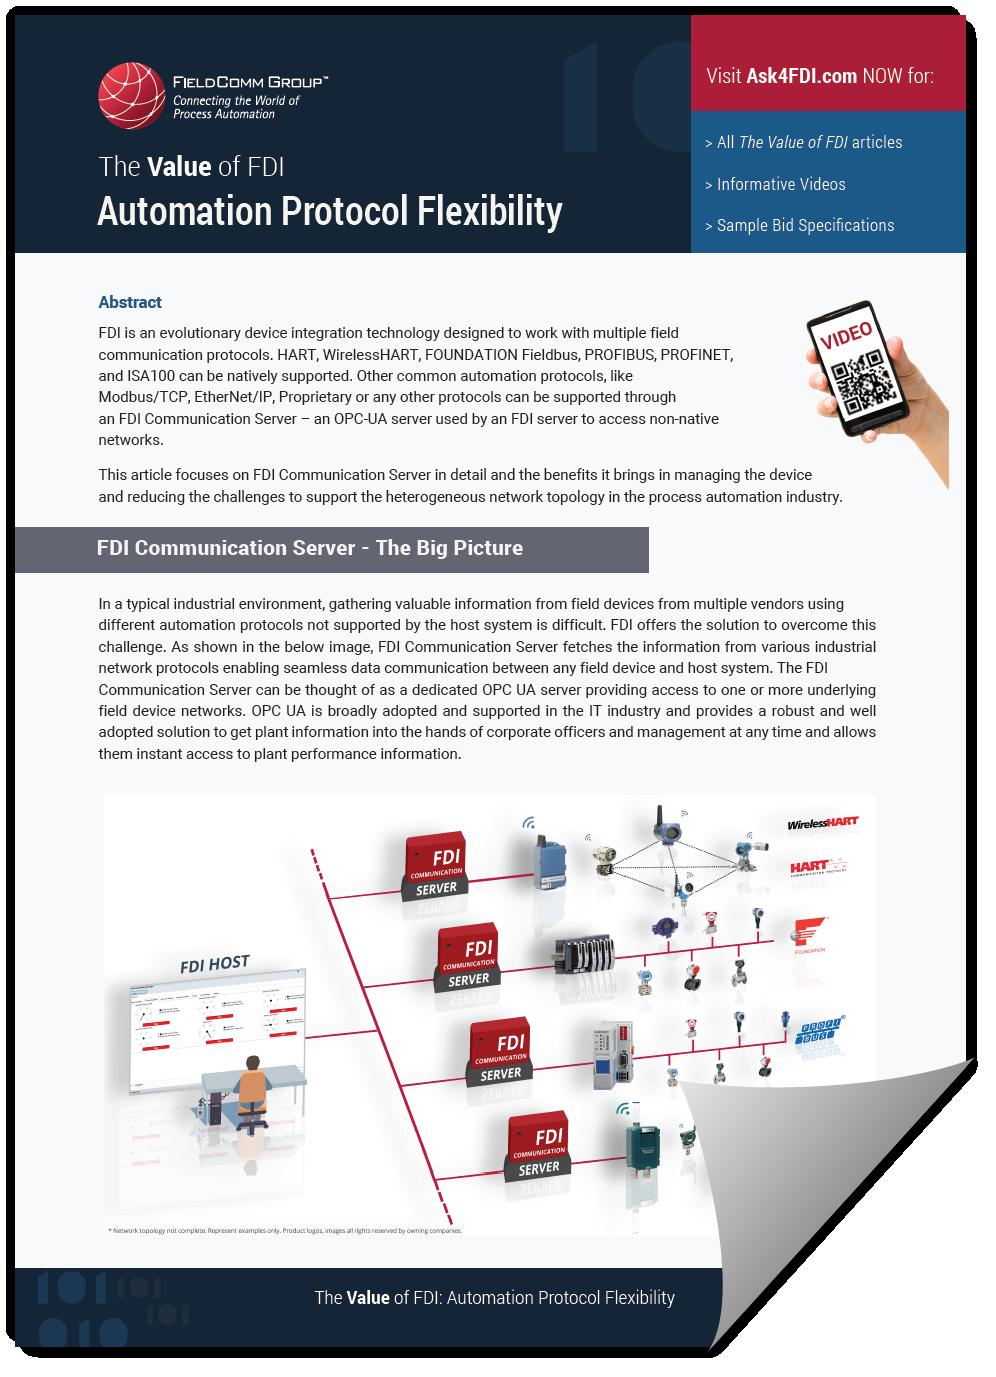 The Value of FDI: Automation Protocol Flexibility -